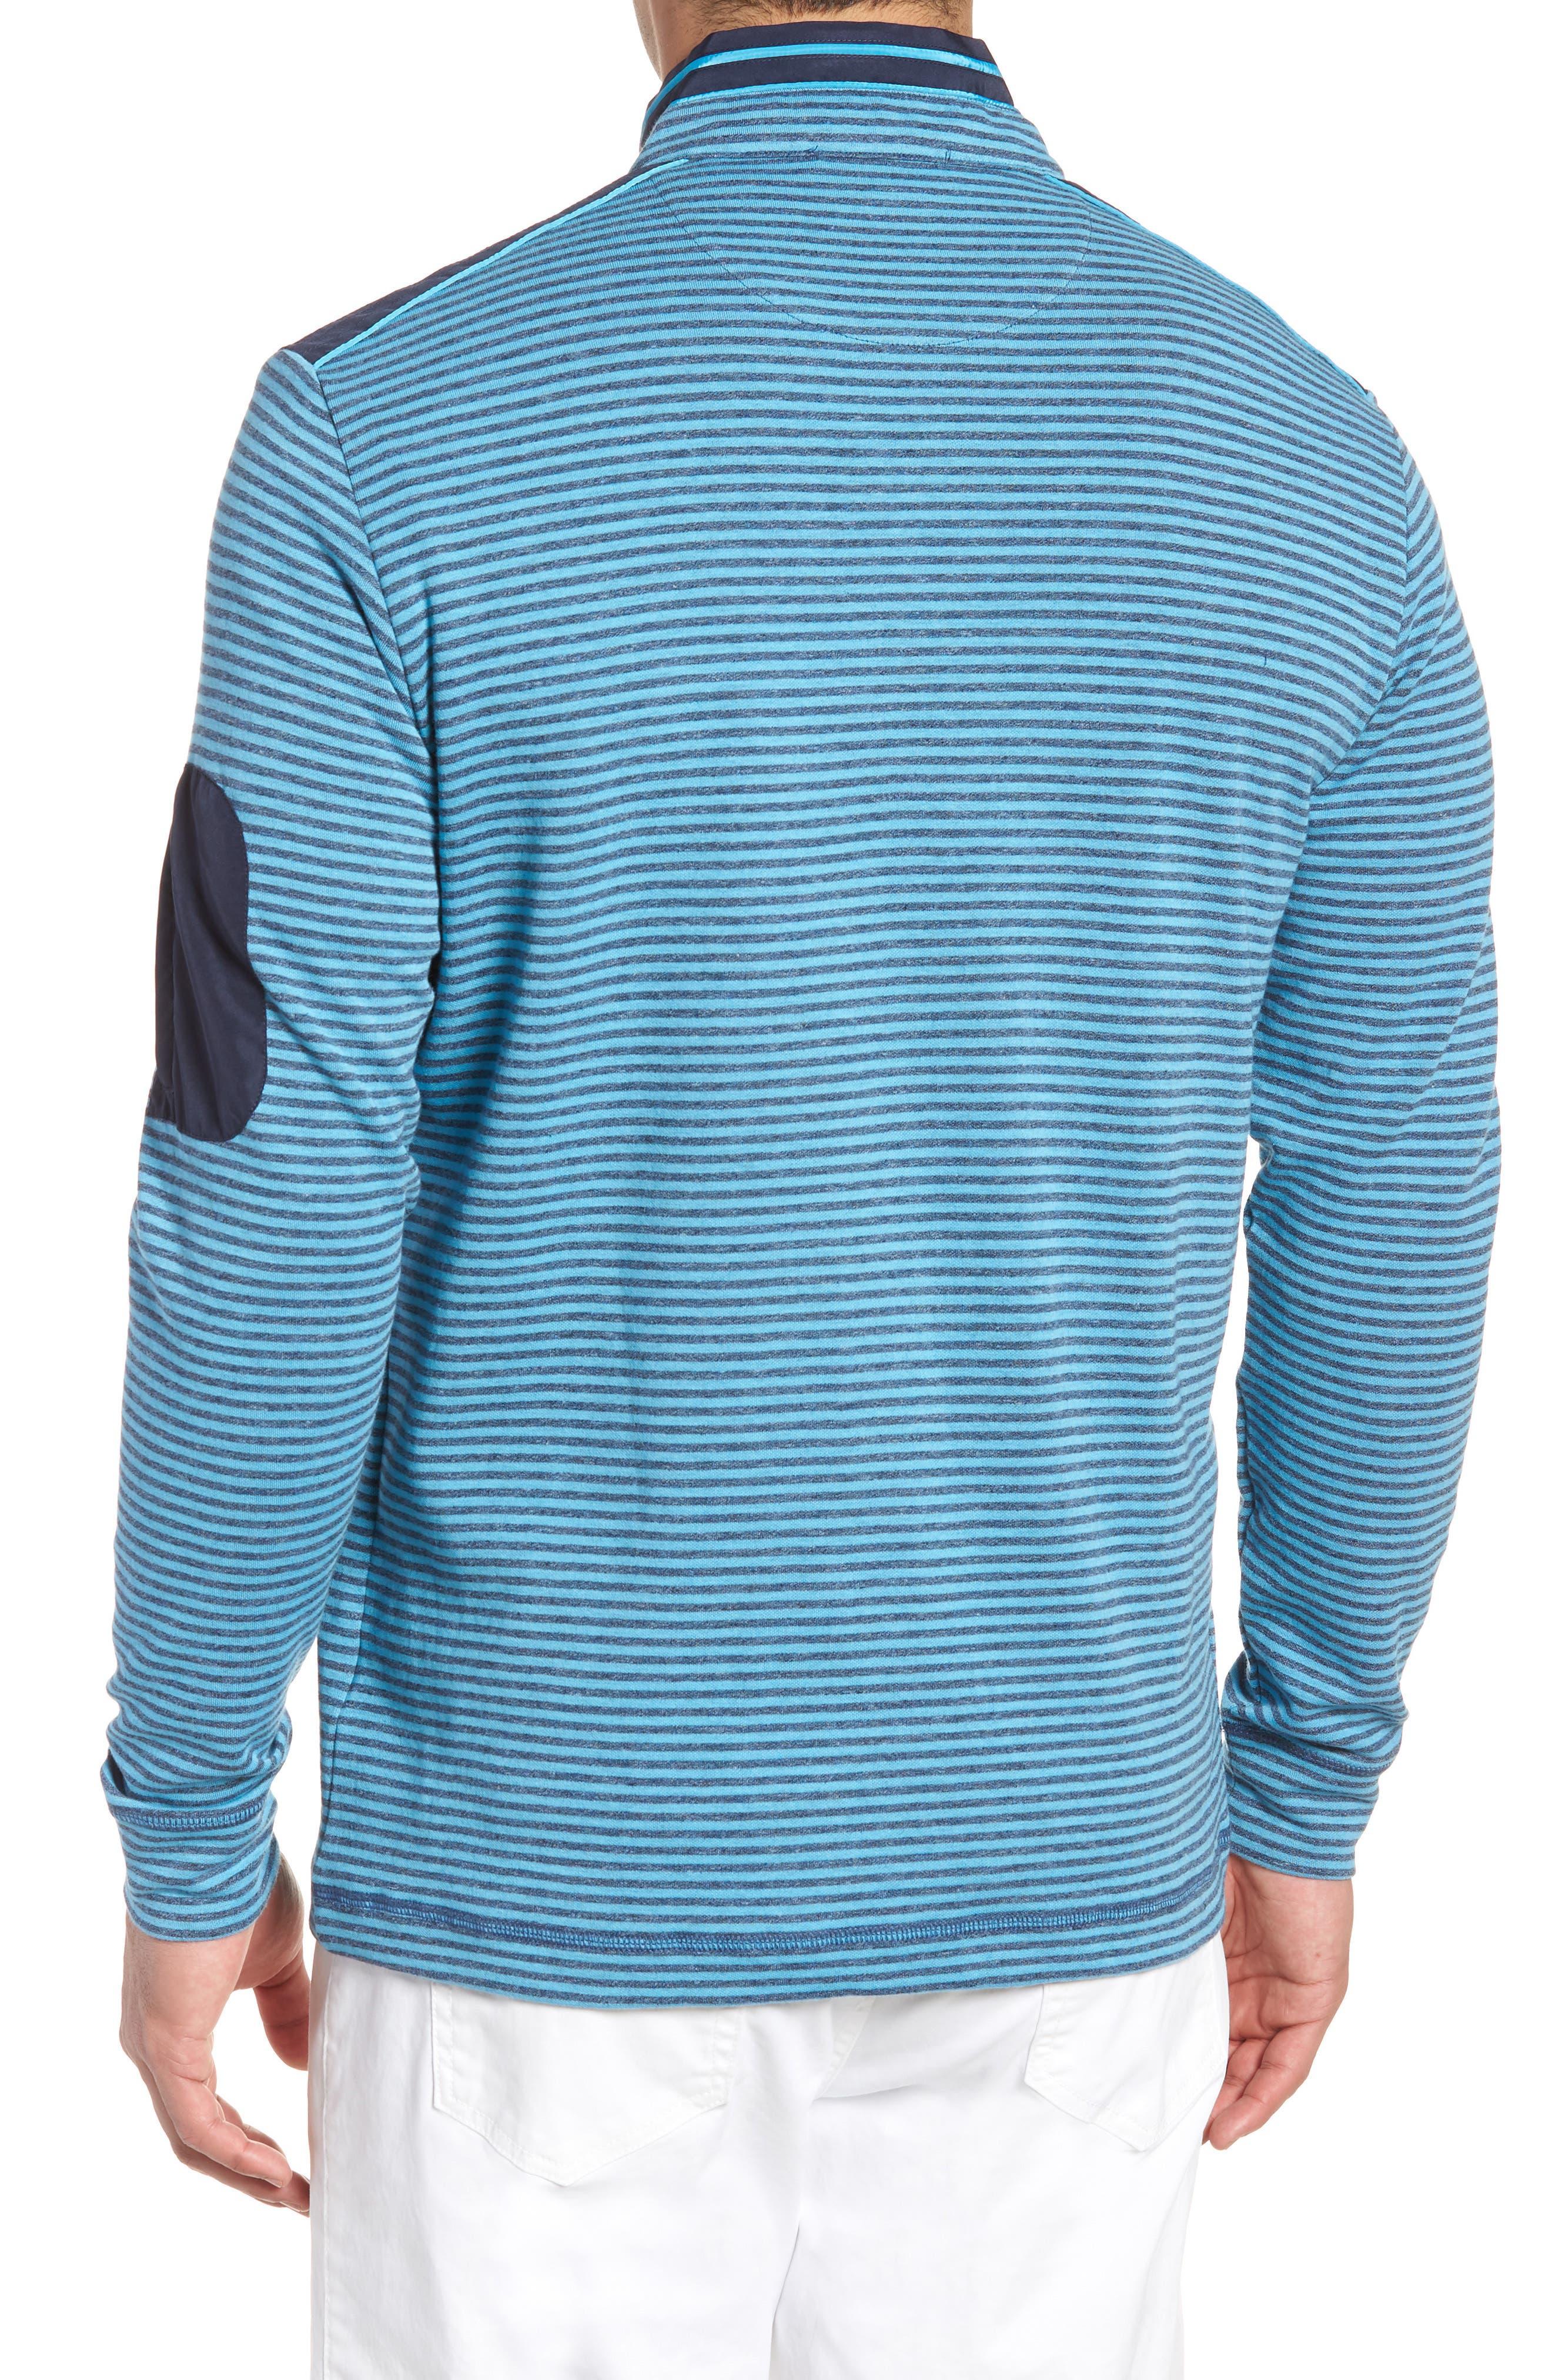 Regular Fit Stripe Quarter Zip Pullover,                             Alternate thumbnail 2, color,                             Sky